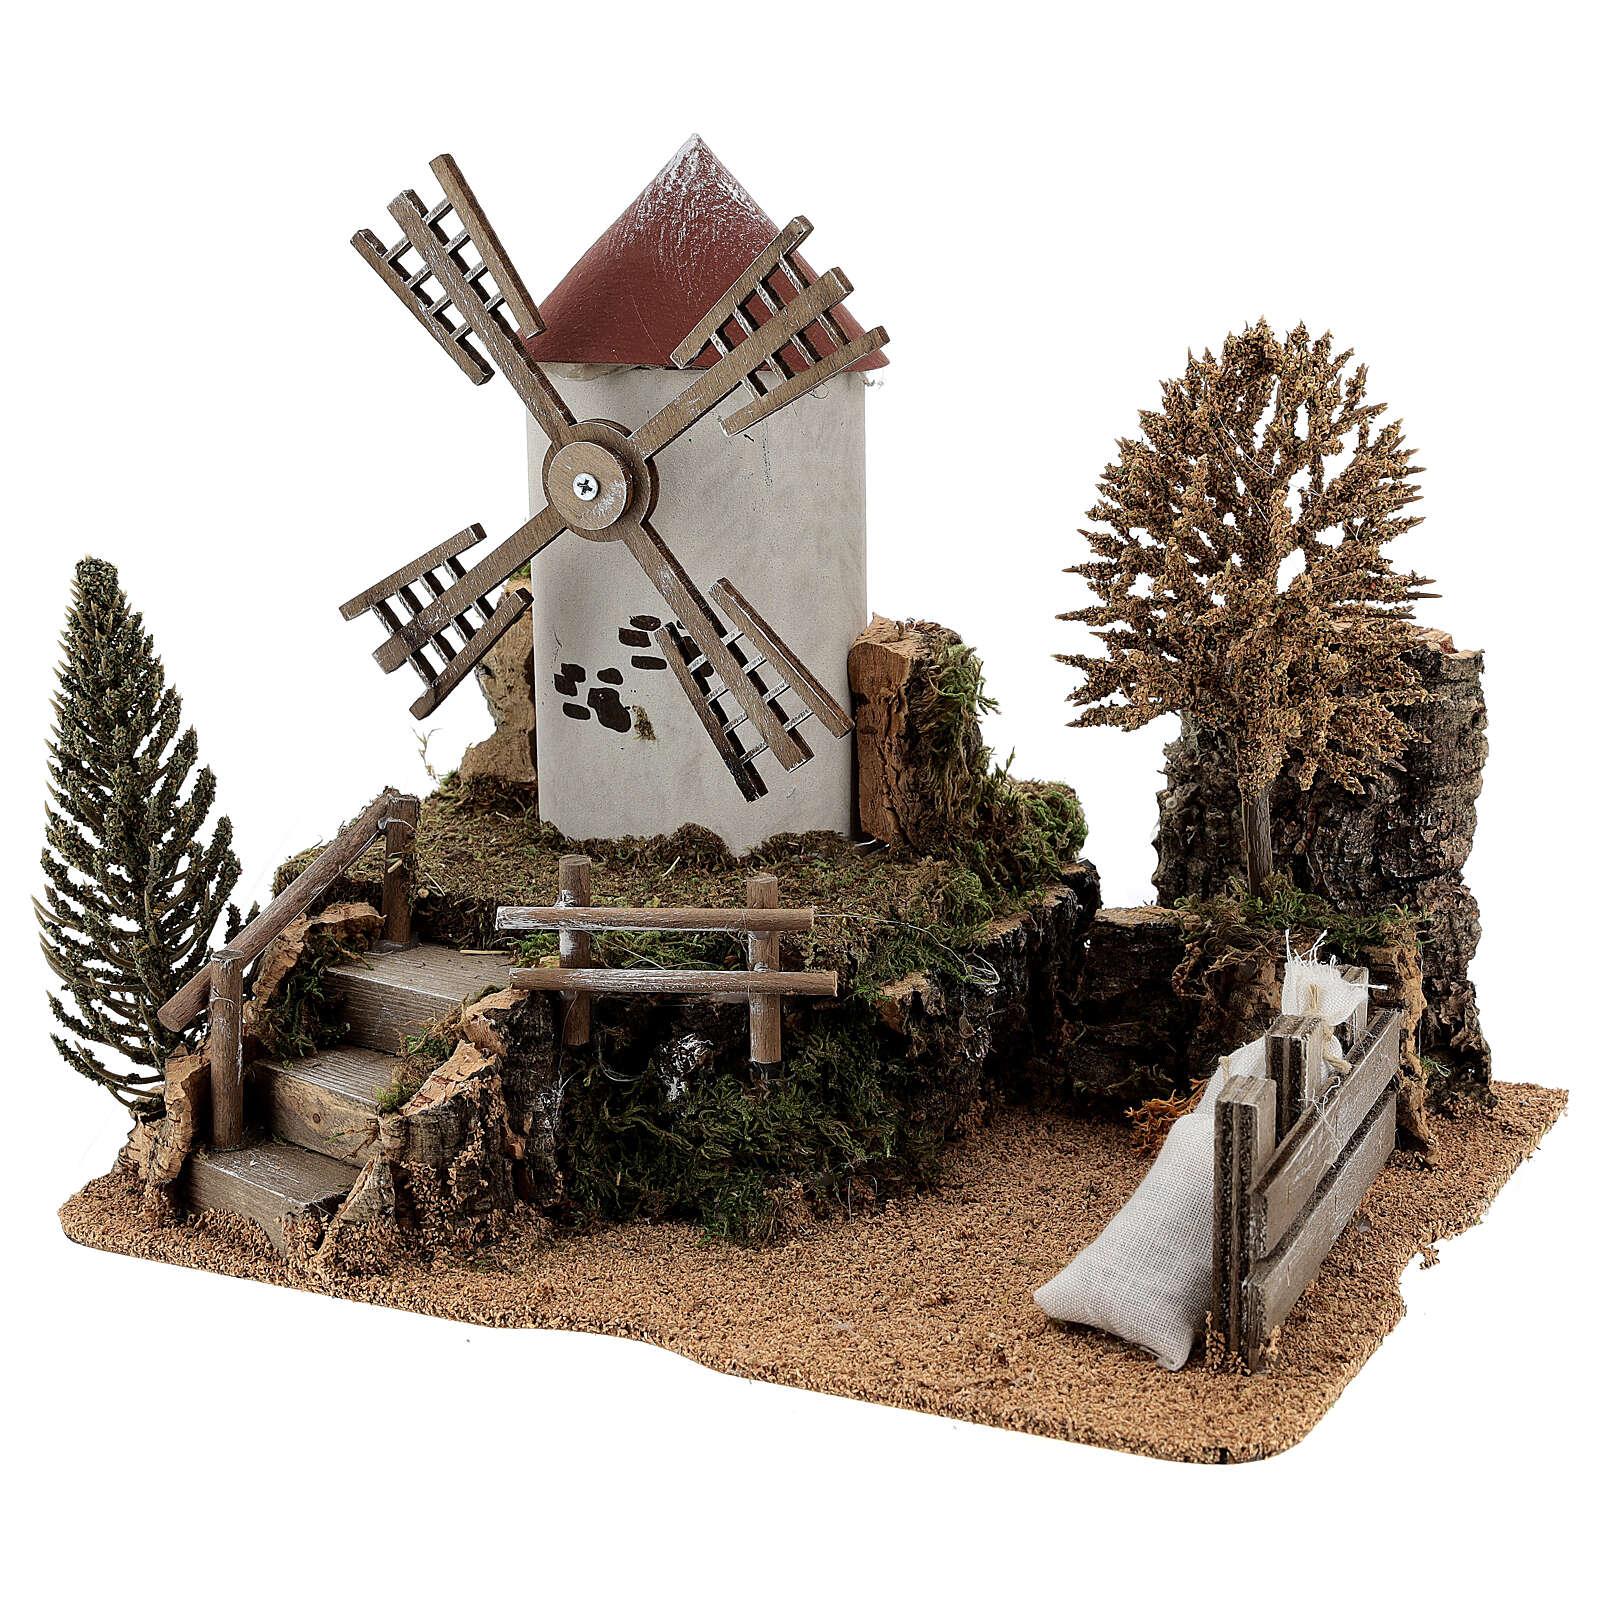 Paisaje molino de viento que funciona belenes 6-8 cm 25x30x20 cm 4